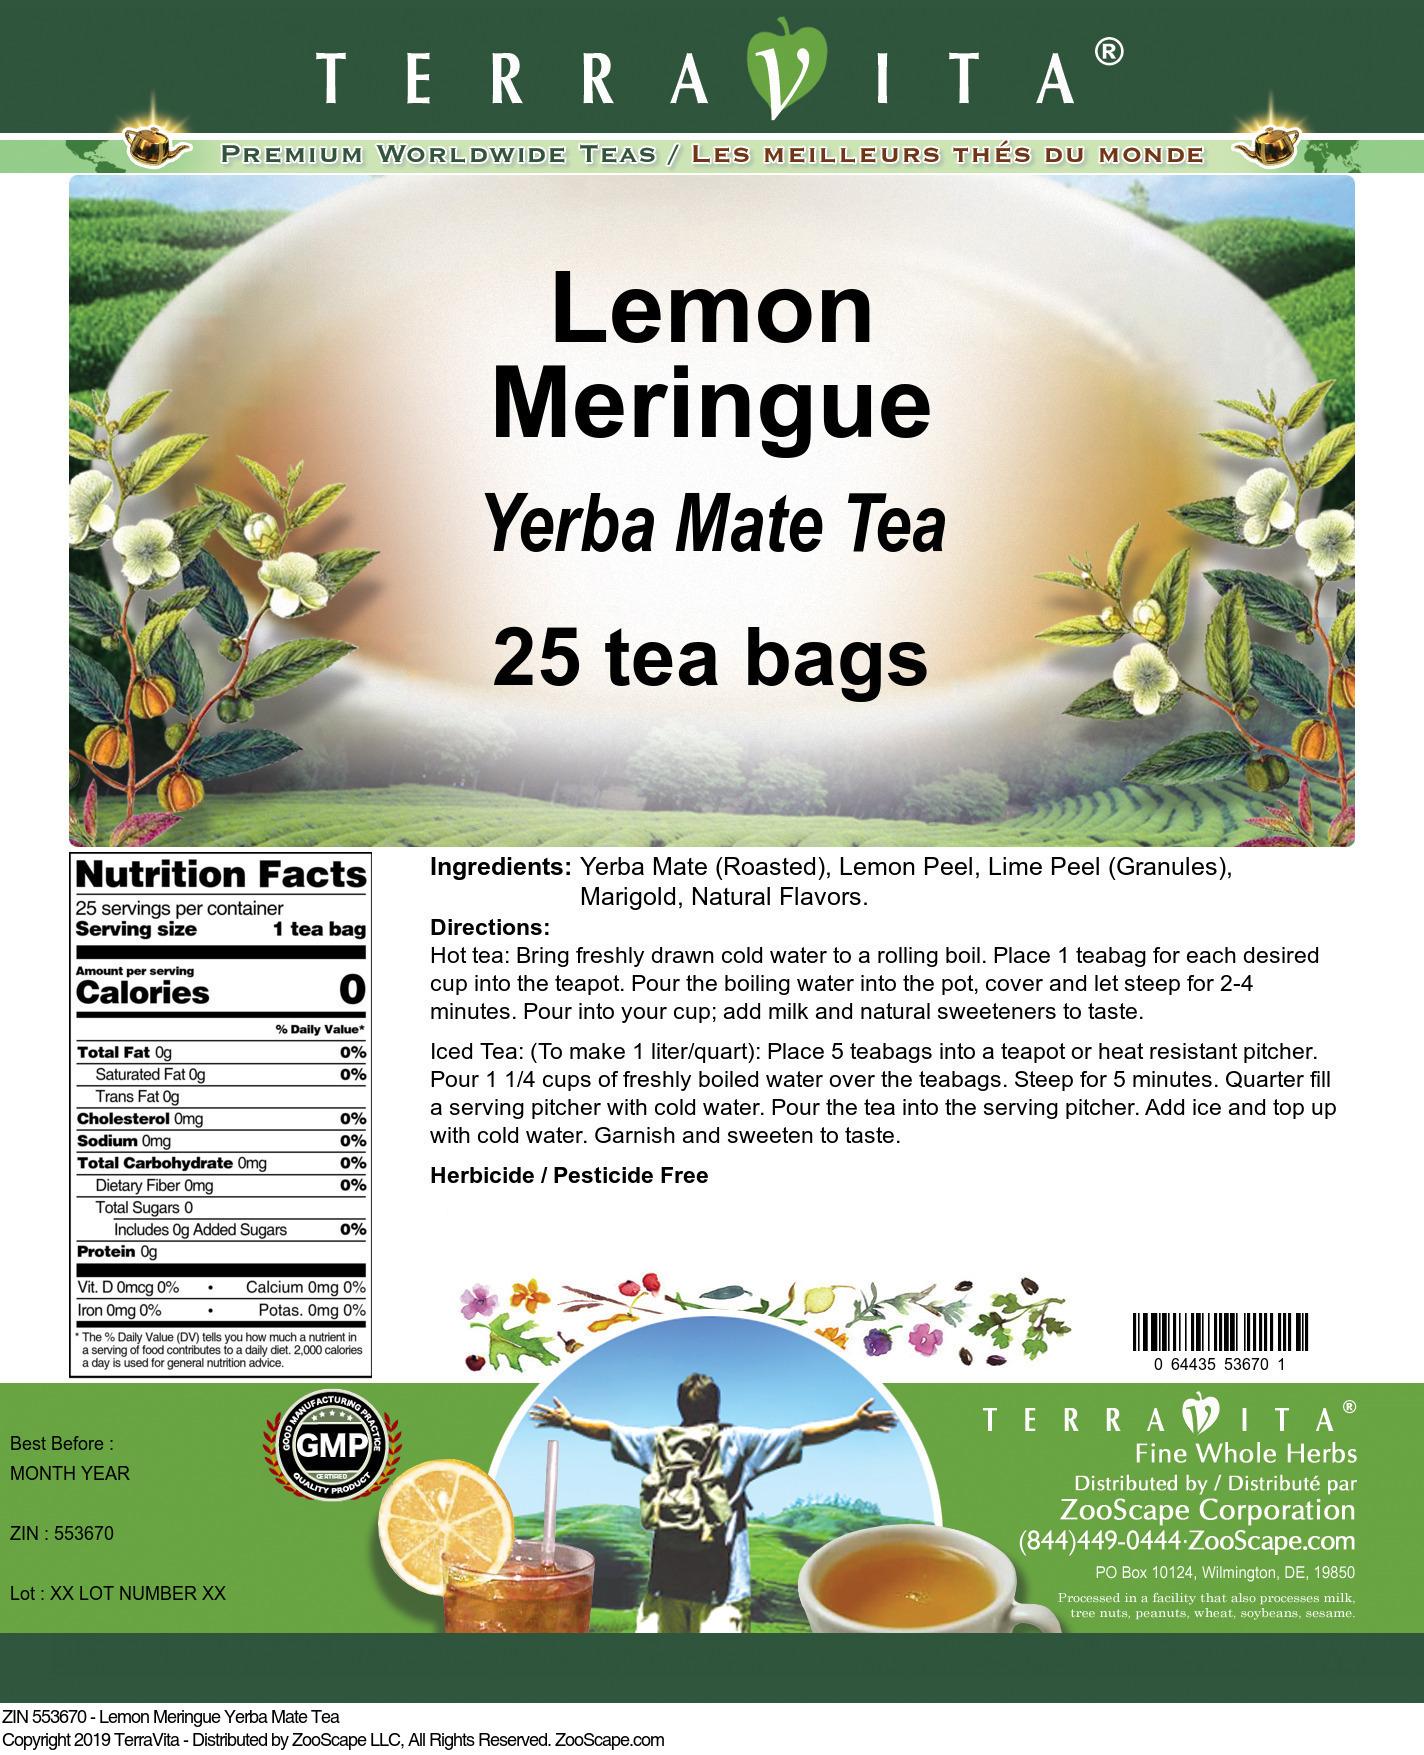 Lemon Meringue Yerba Mate